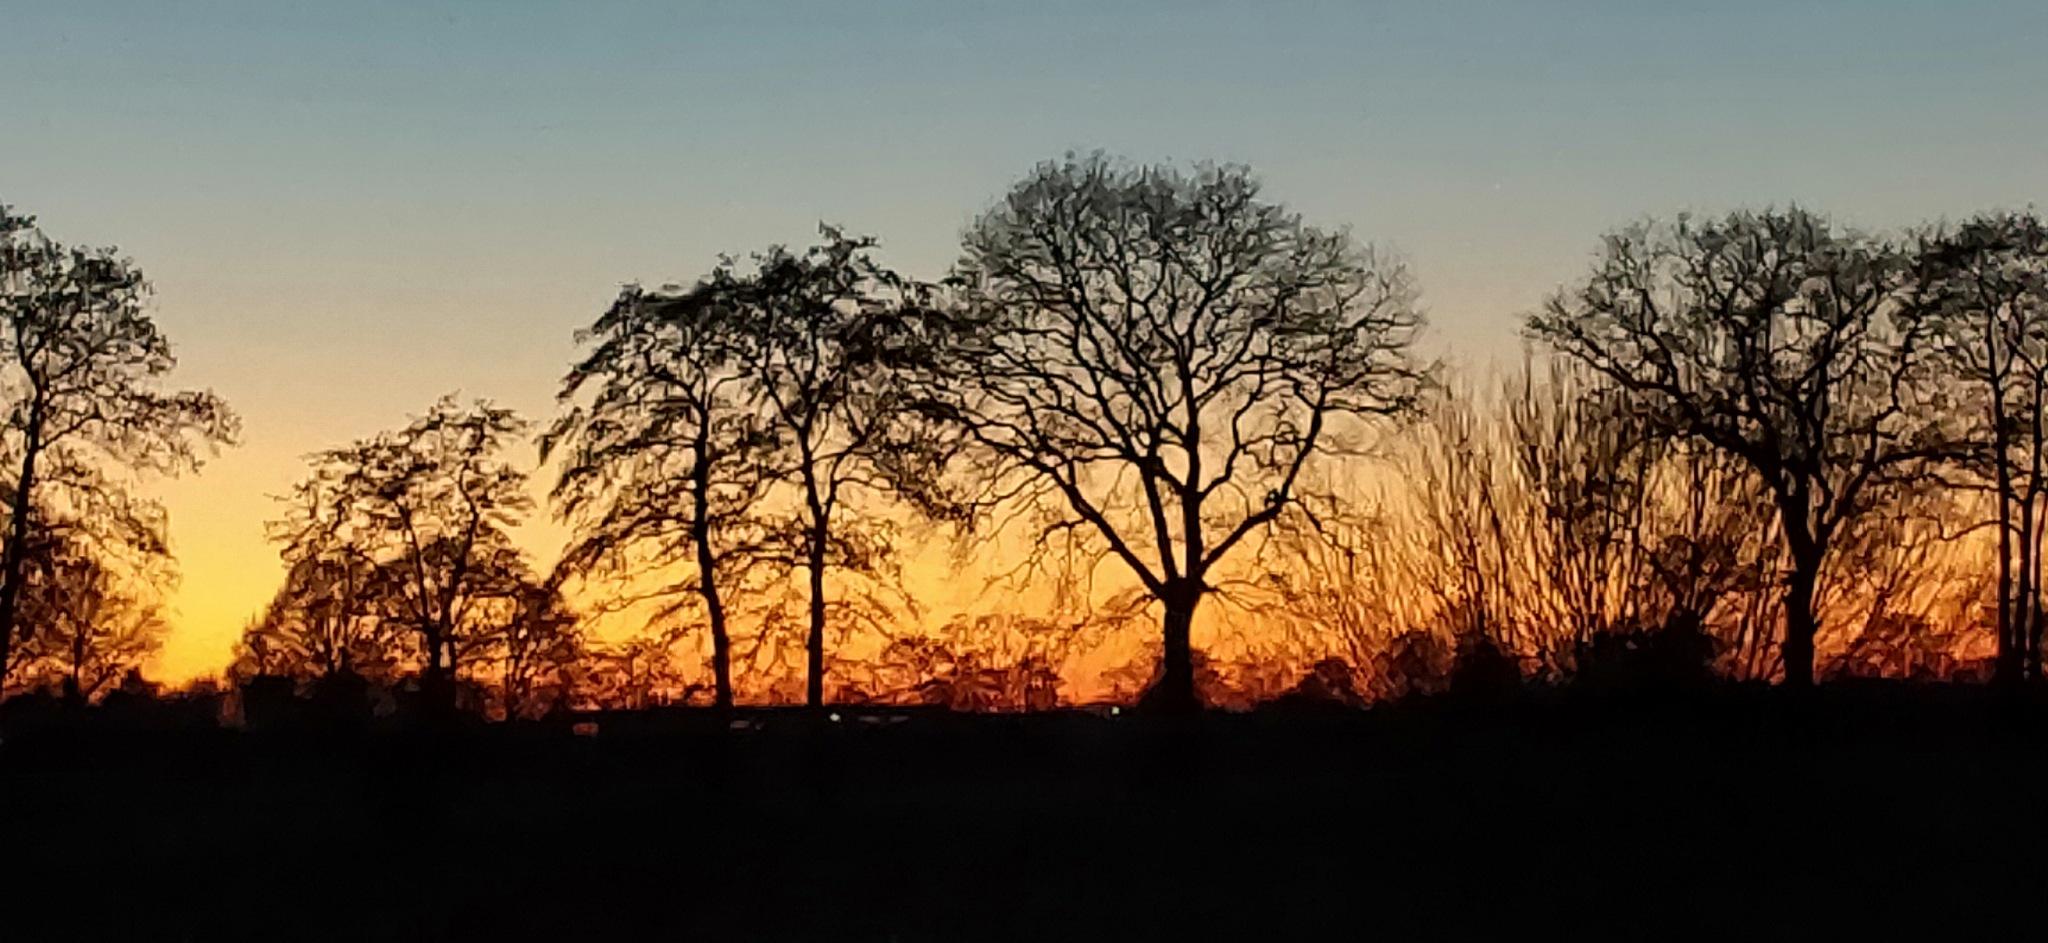 zonsondergang by gerda